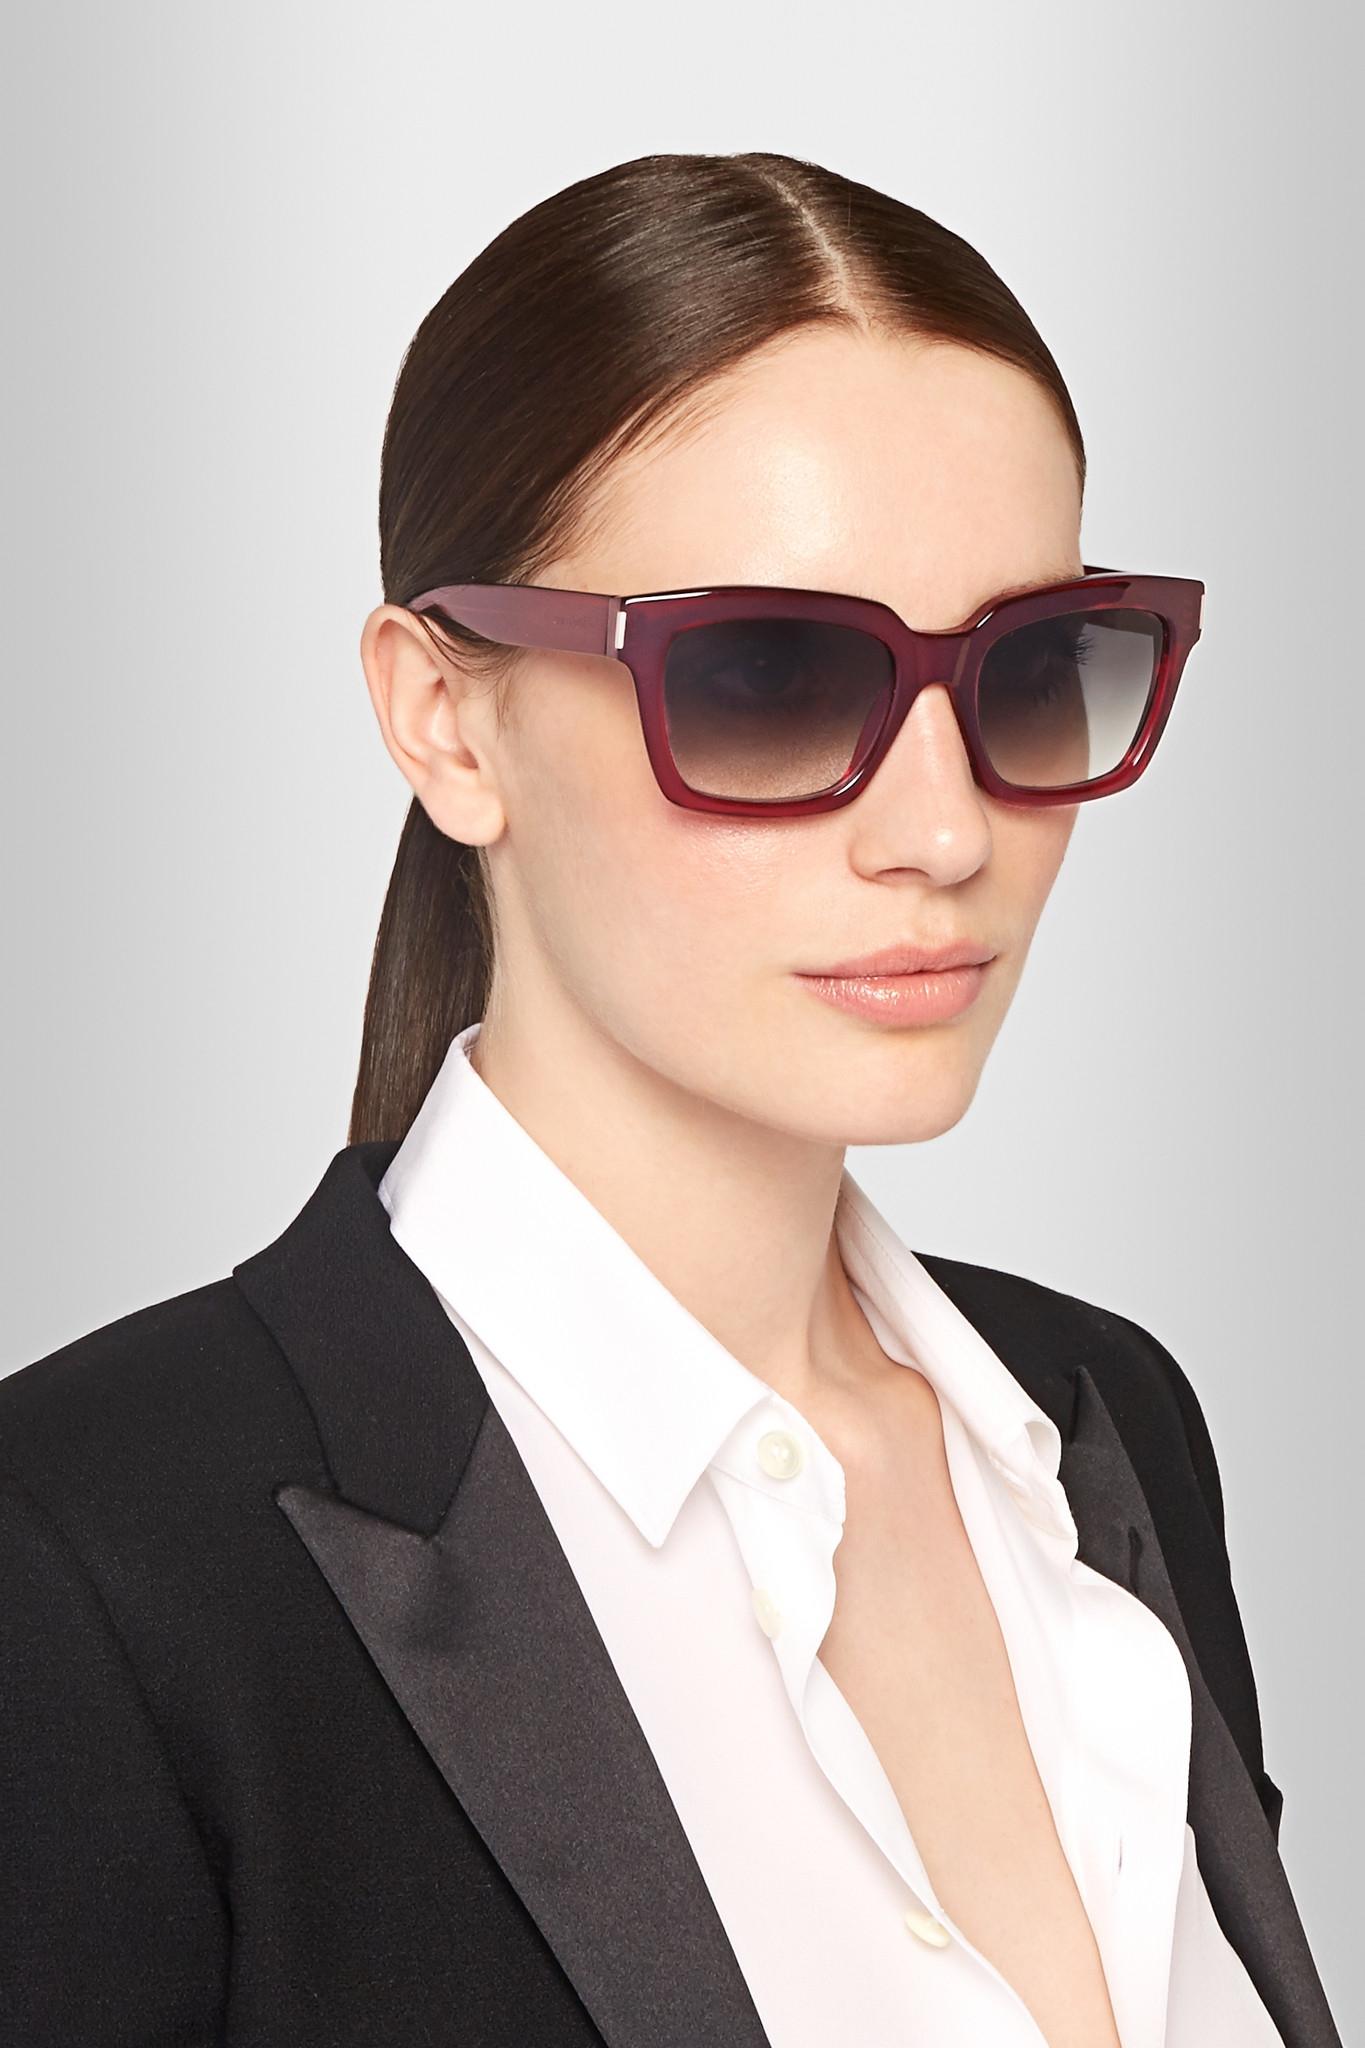 2276c66203 Saint Laurent Bold D-frame Acetate Sunglasses in Red - Lyst